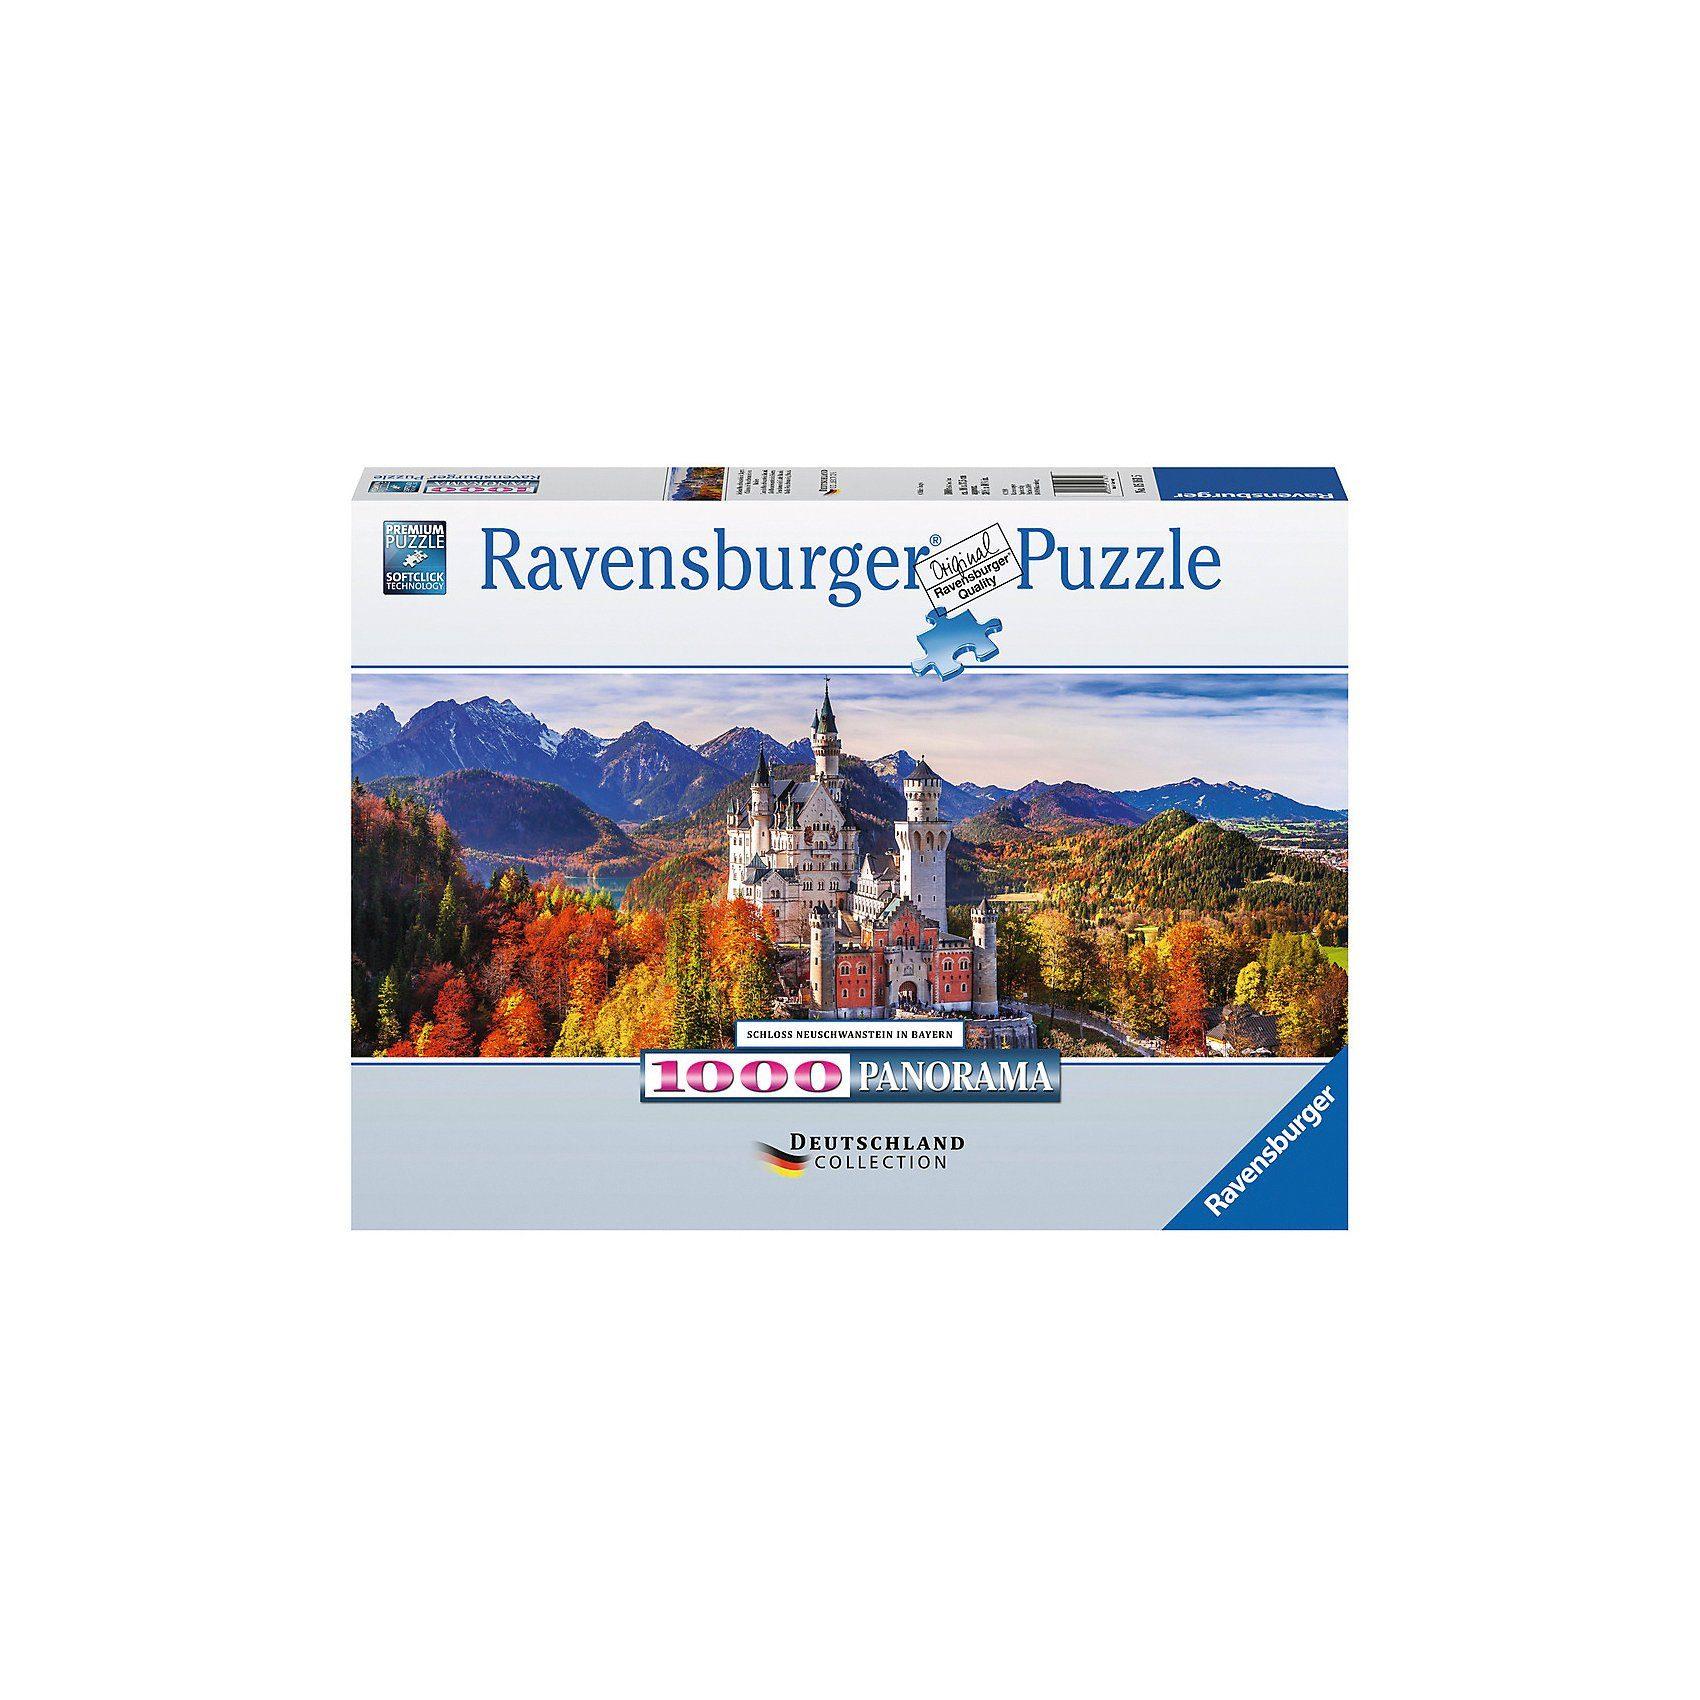 Ravensburger Puzzle 1000 Teile, 98x37 cm, Panorama, Schloss Neuschwanstei